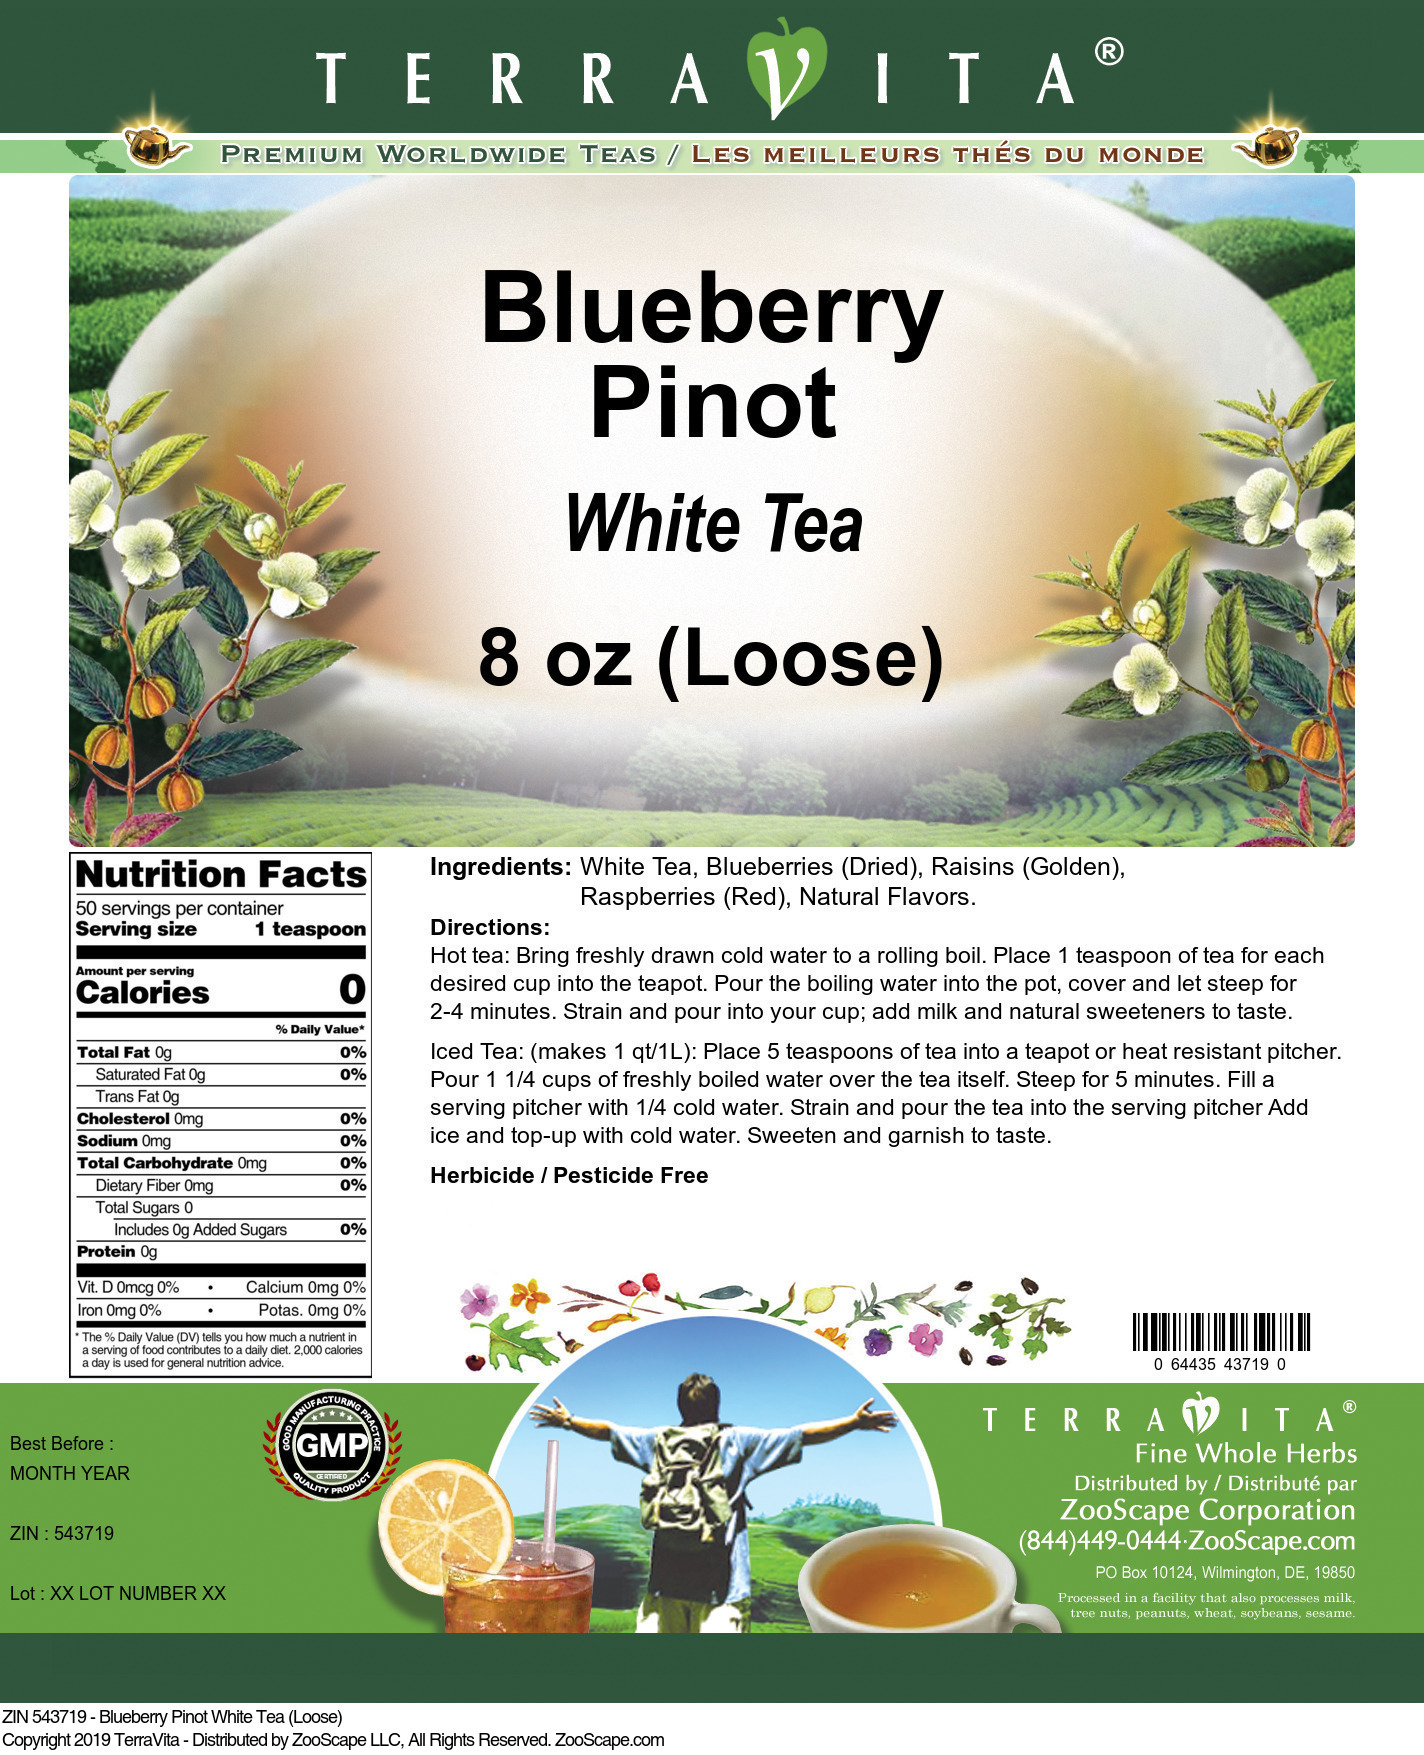 Blueberry Pinot White Tea (Loose)